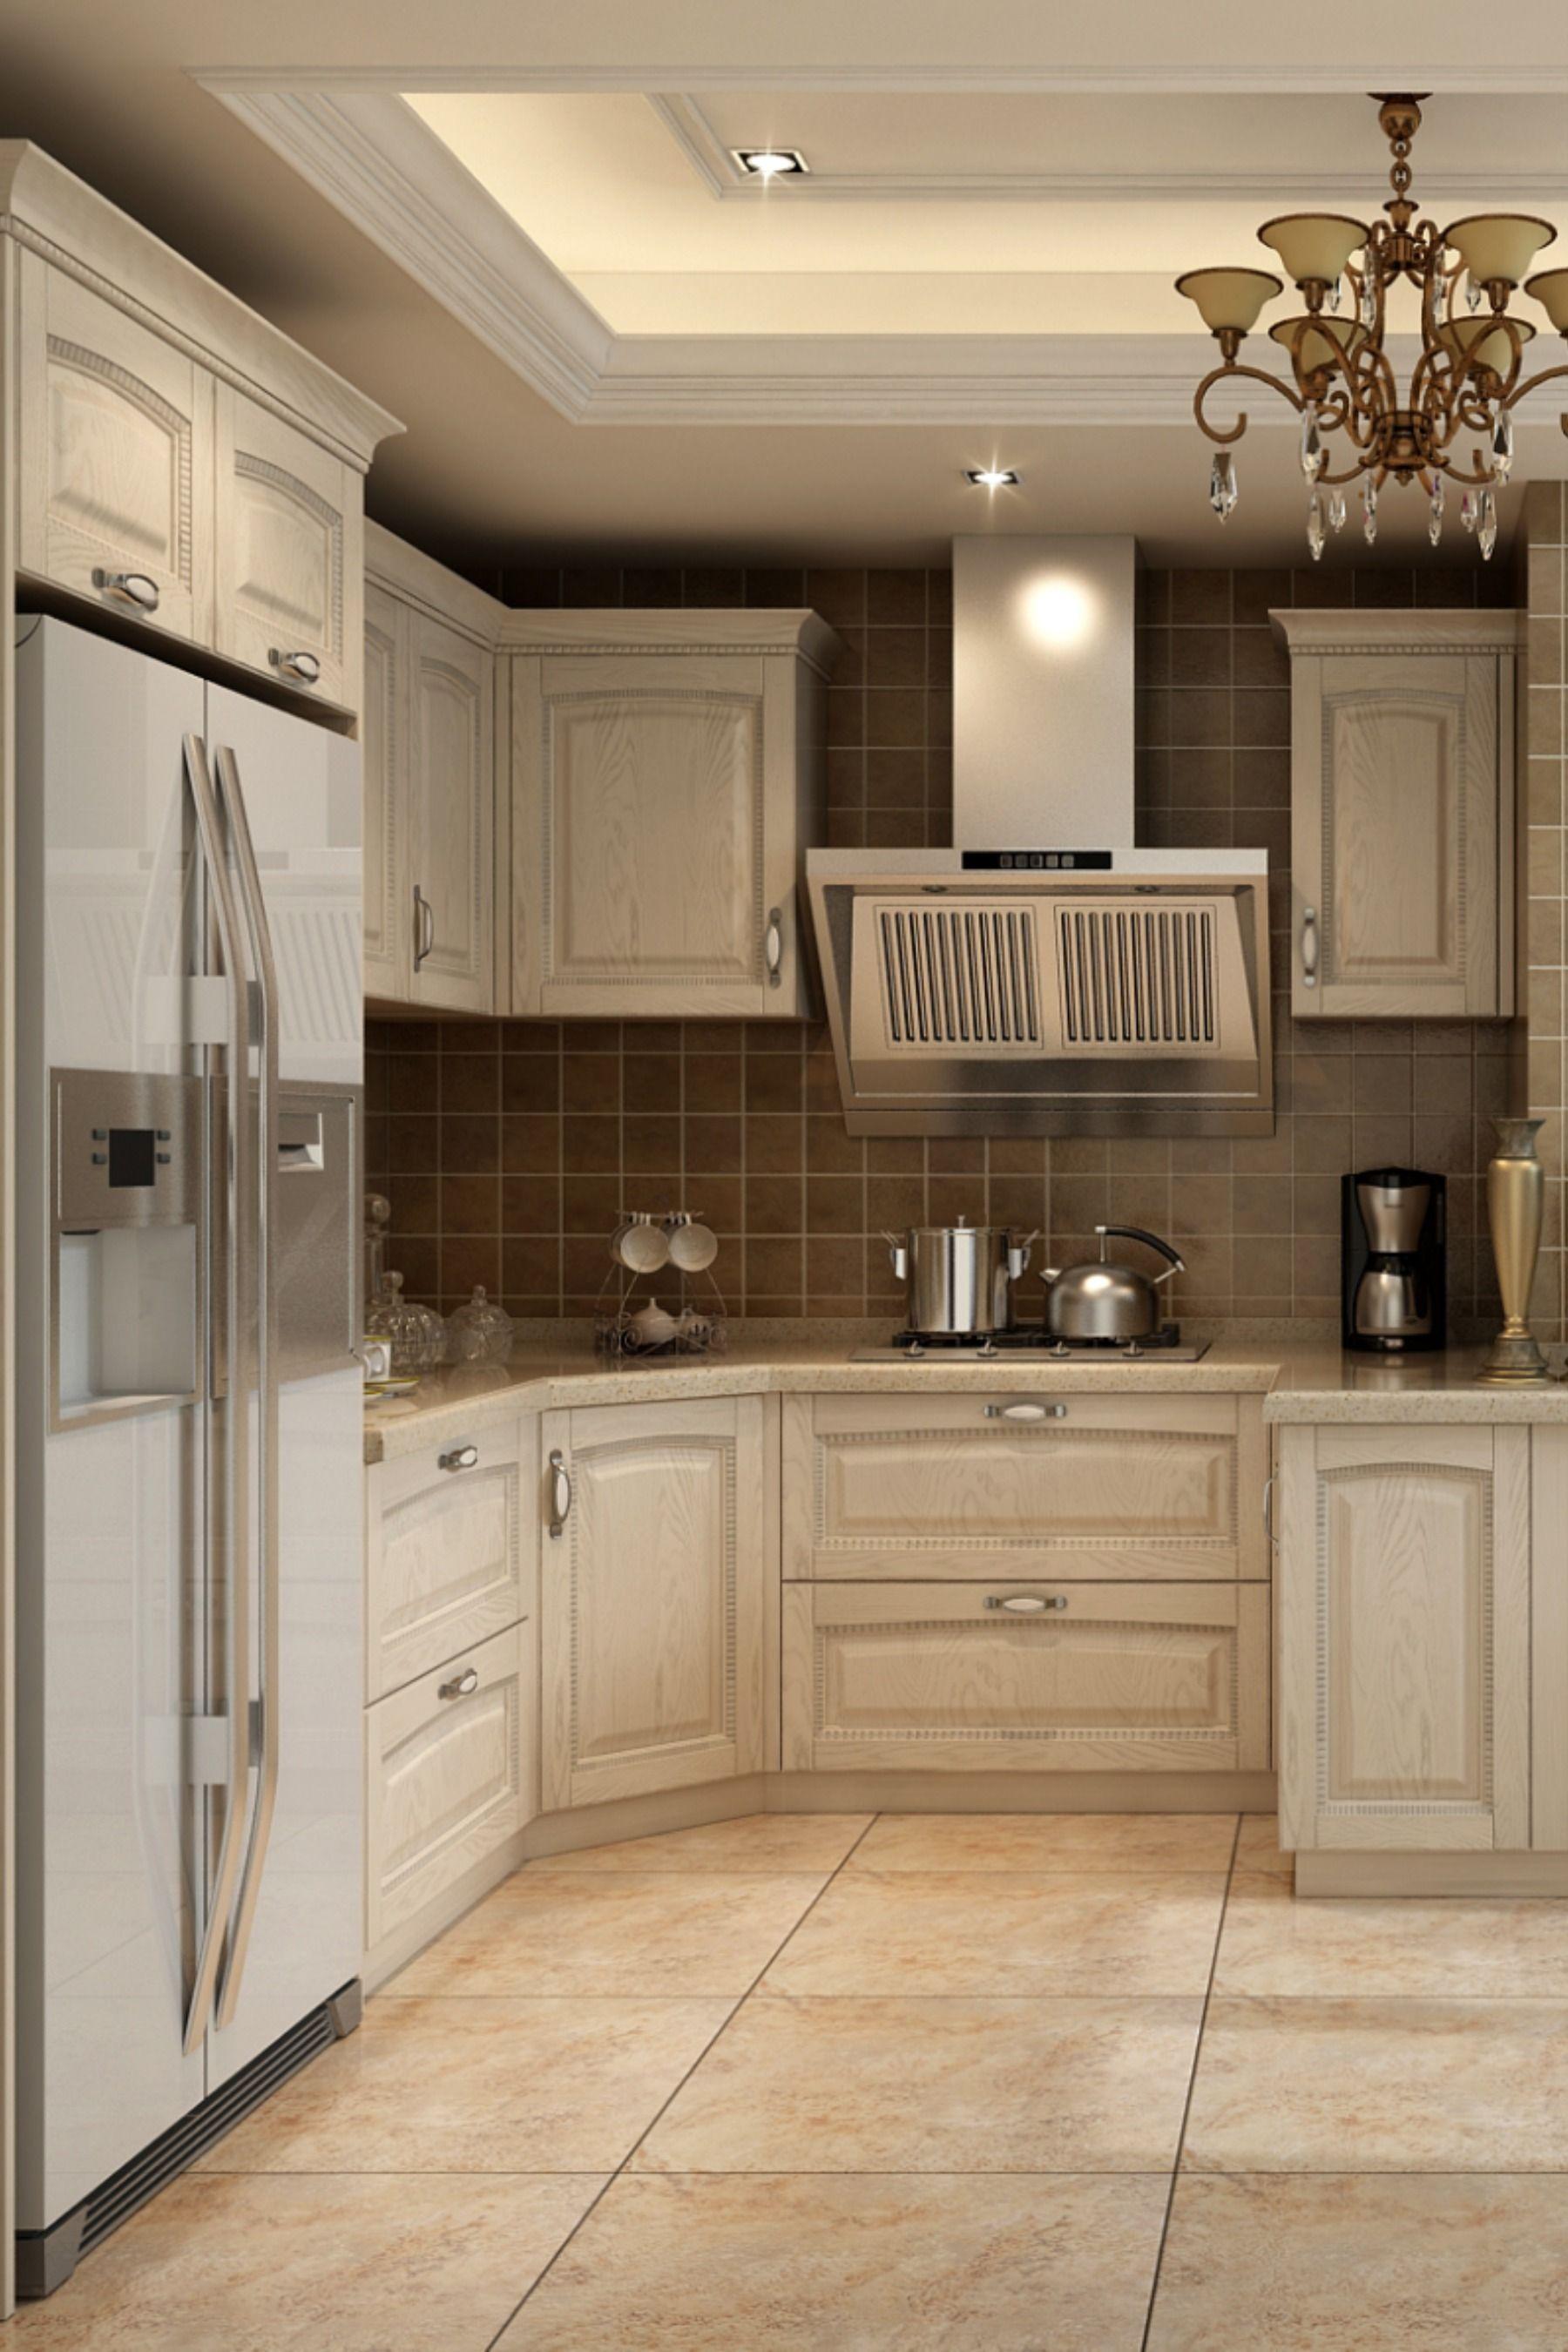 Pvc Blister Kitchen Cabinet Kitchen Cabinets Wooden Kitchen Cabinets Kitchen